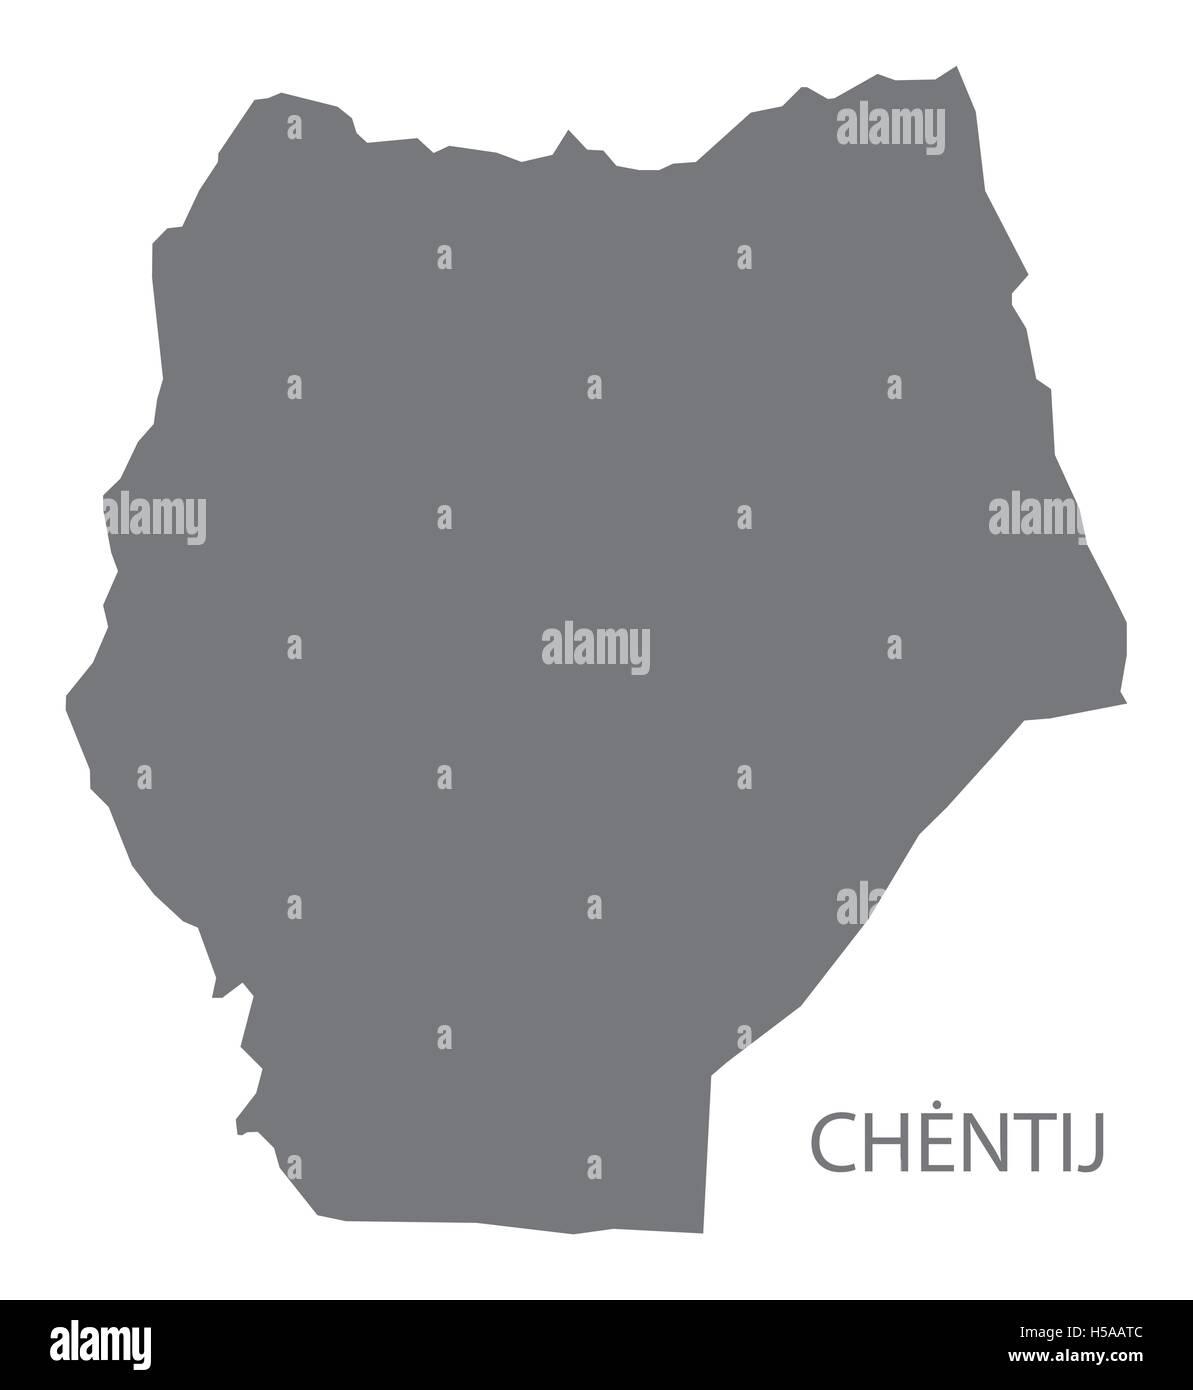 Chentij Mongolia Map grey - Stock Vector